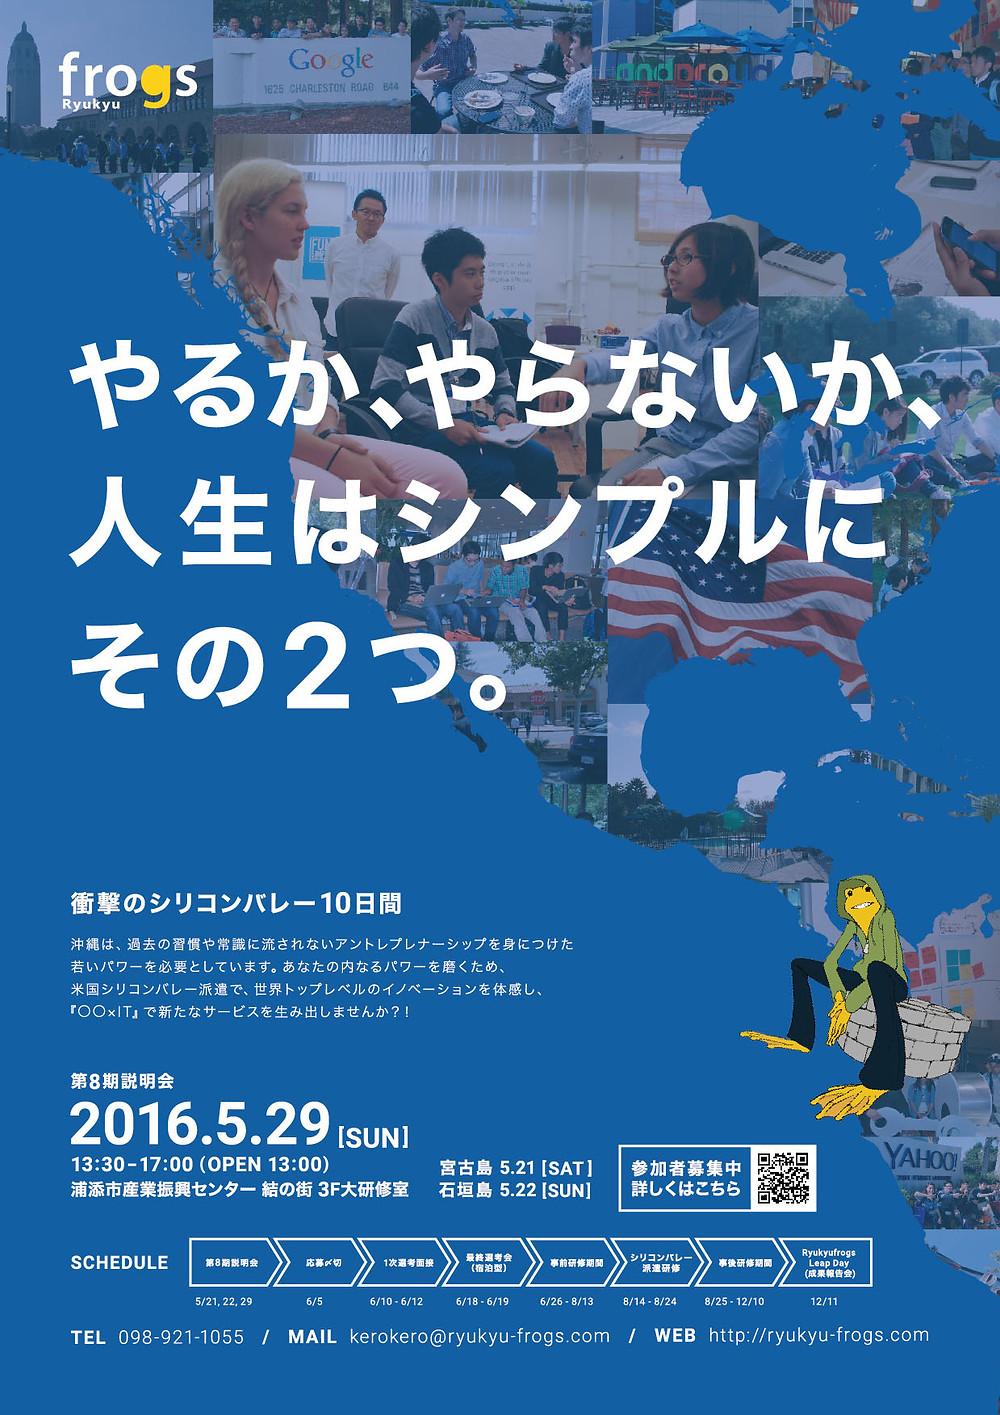 Ryukyufrogs2015_A4_flyer_ol_20160408_1500_omote